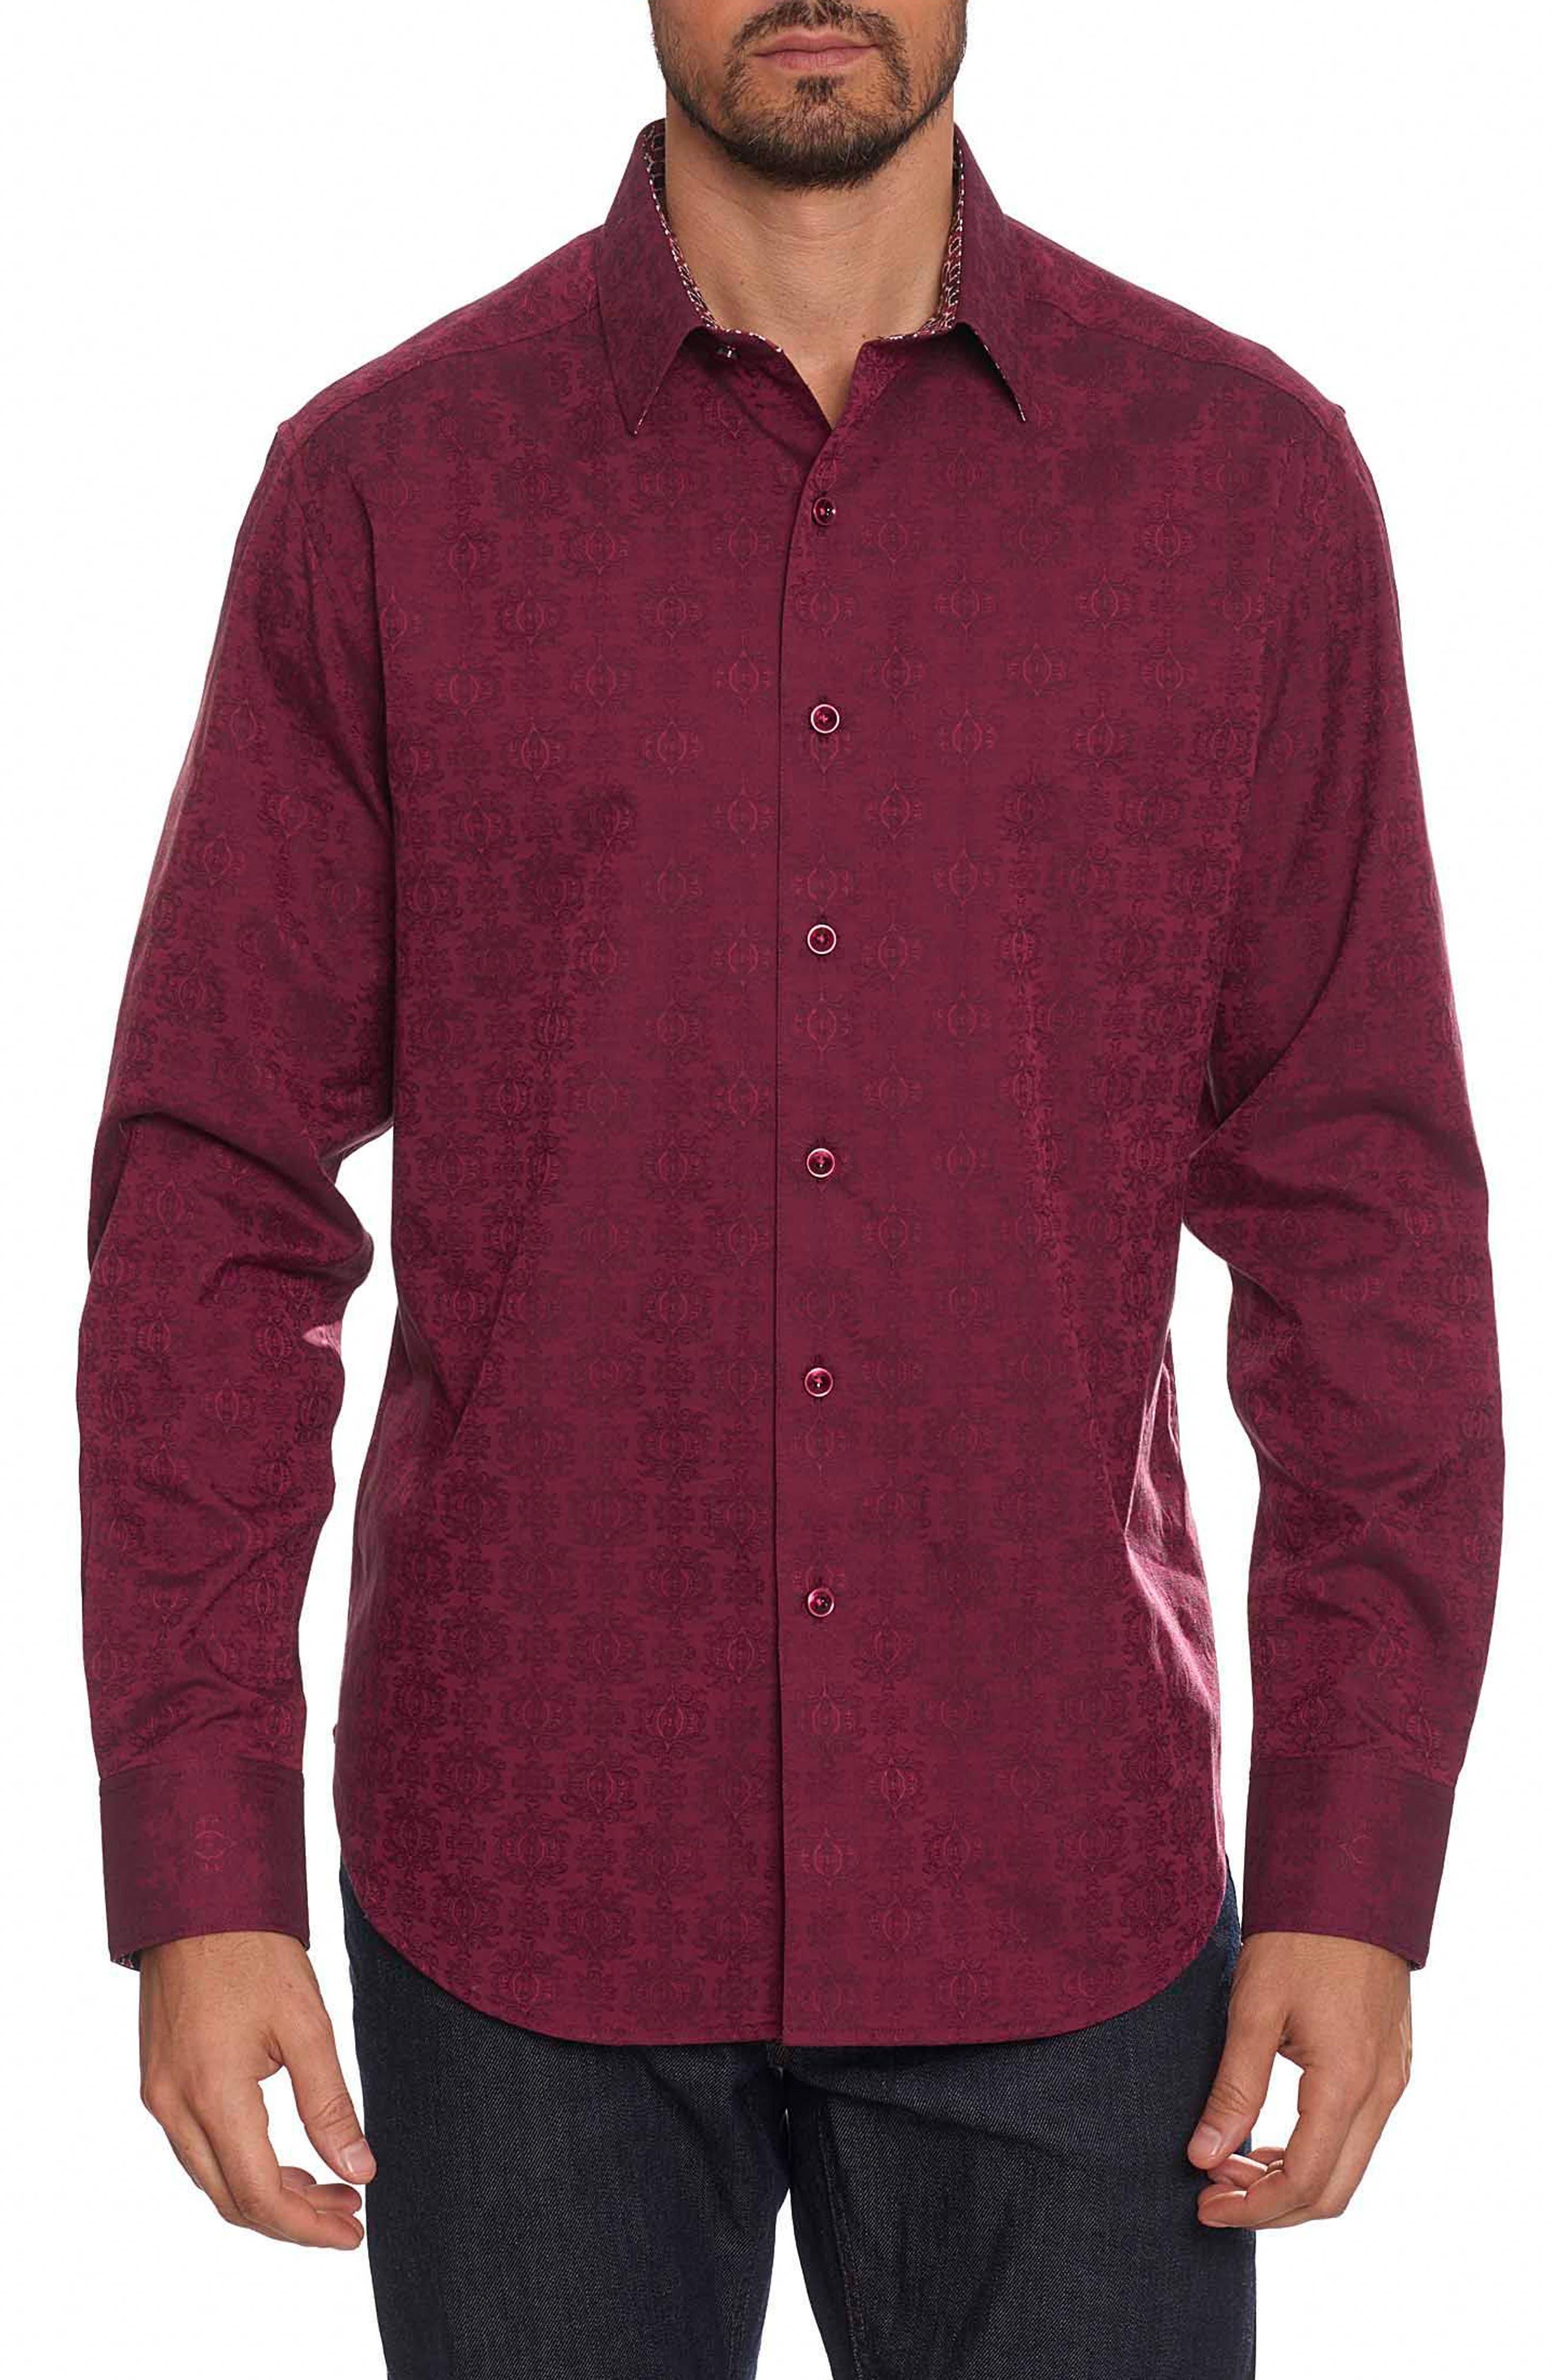 Cullen Classic Fit Jacquard Sport Shirt,                             Main thumbnail 1, color,